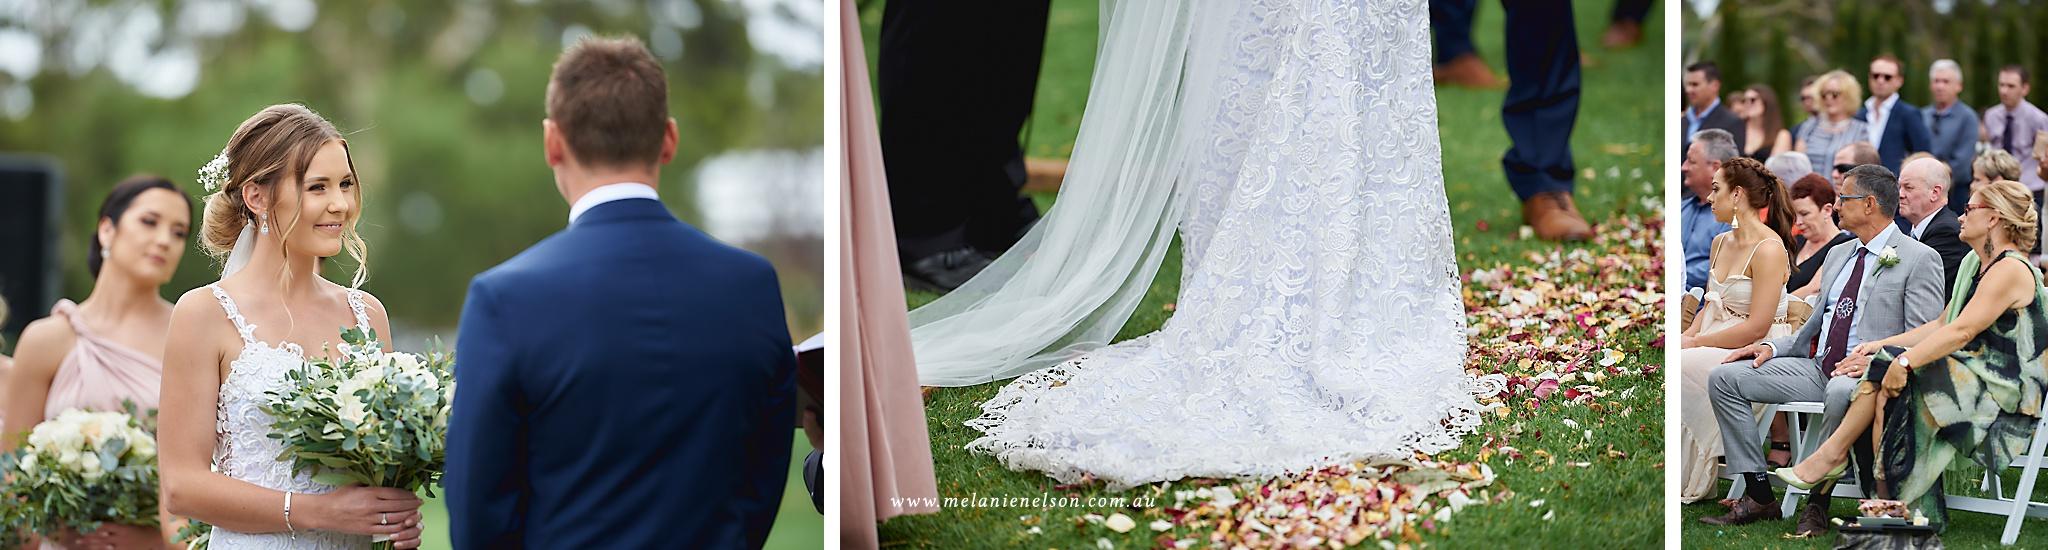 serafino_wedding_photography_0035.jpg